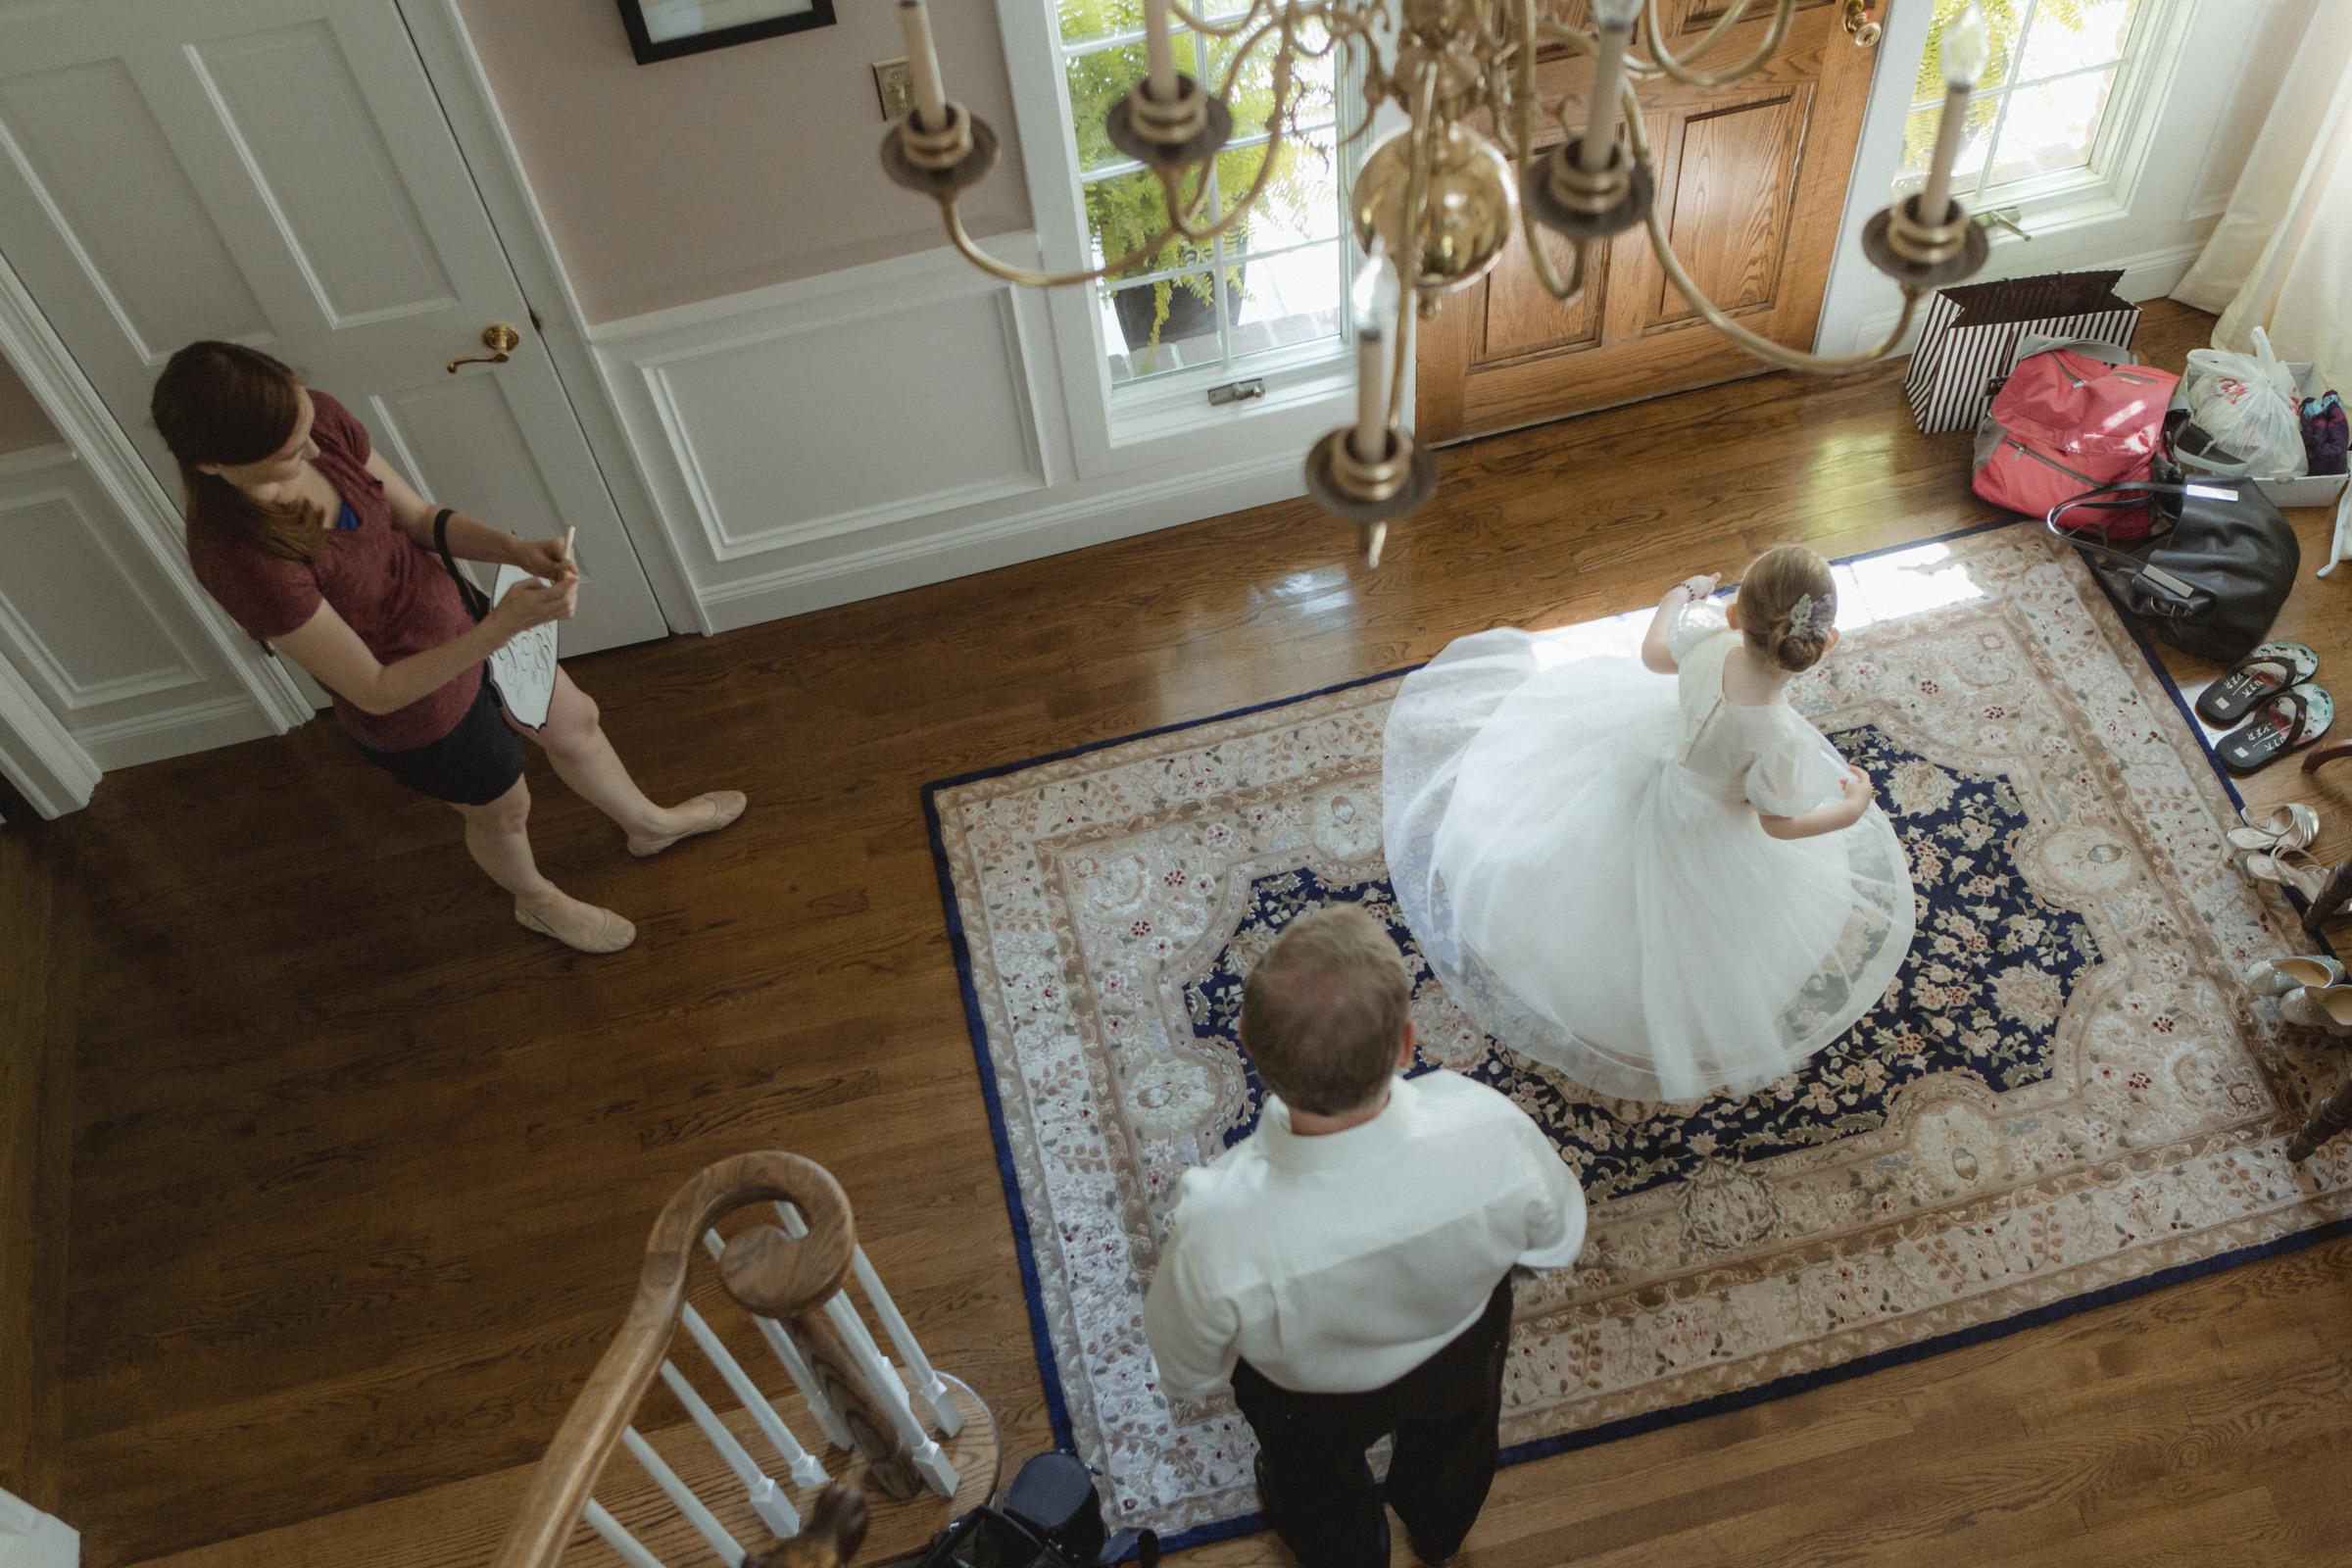 Flowergirl twirls in her dress - Estate at Florentine Gardens wedding - Hudson Valley Wedding - Kelsey & Anish's wedding - Amy Sims Photography